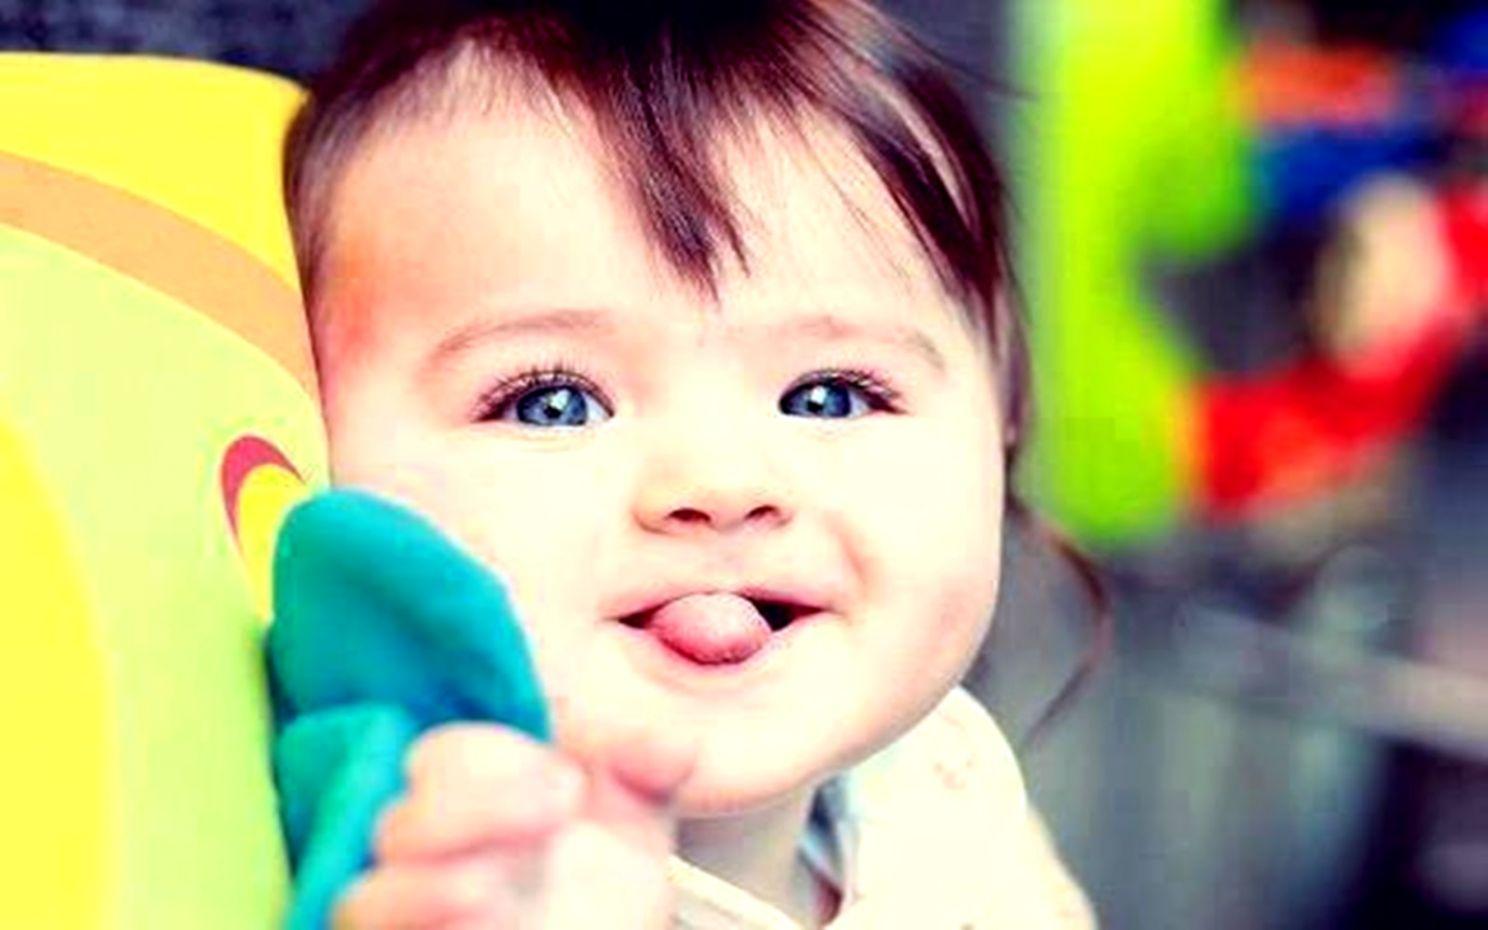 cute baby wallpaper | best wallpapers hd gallery